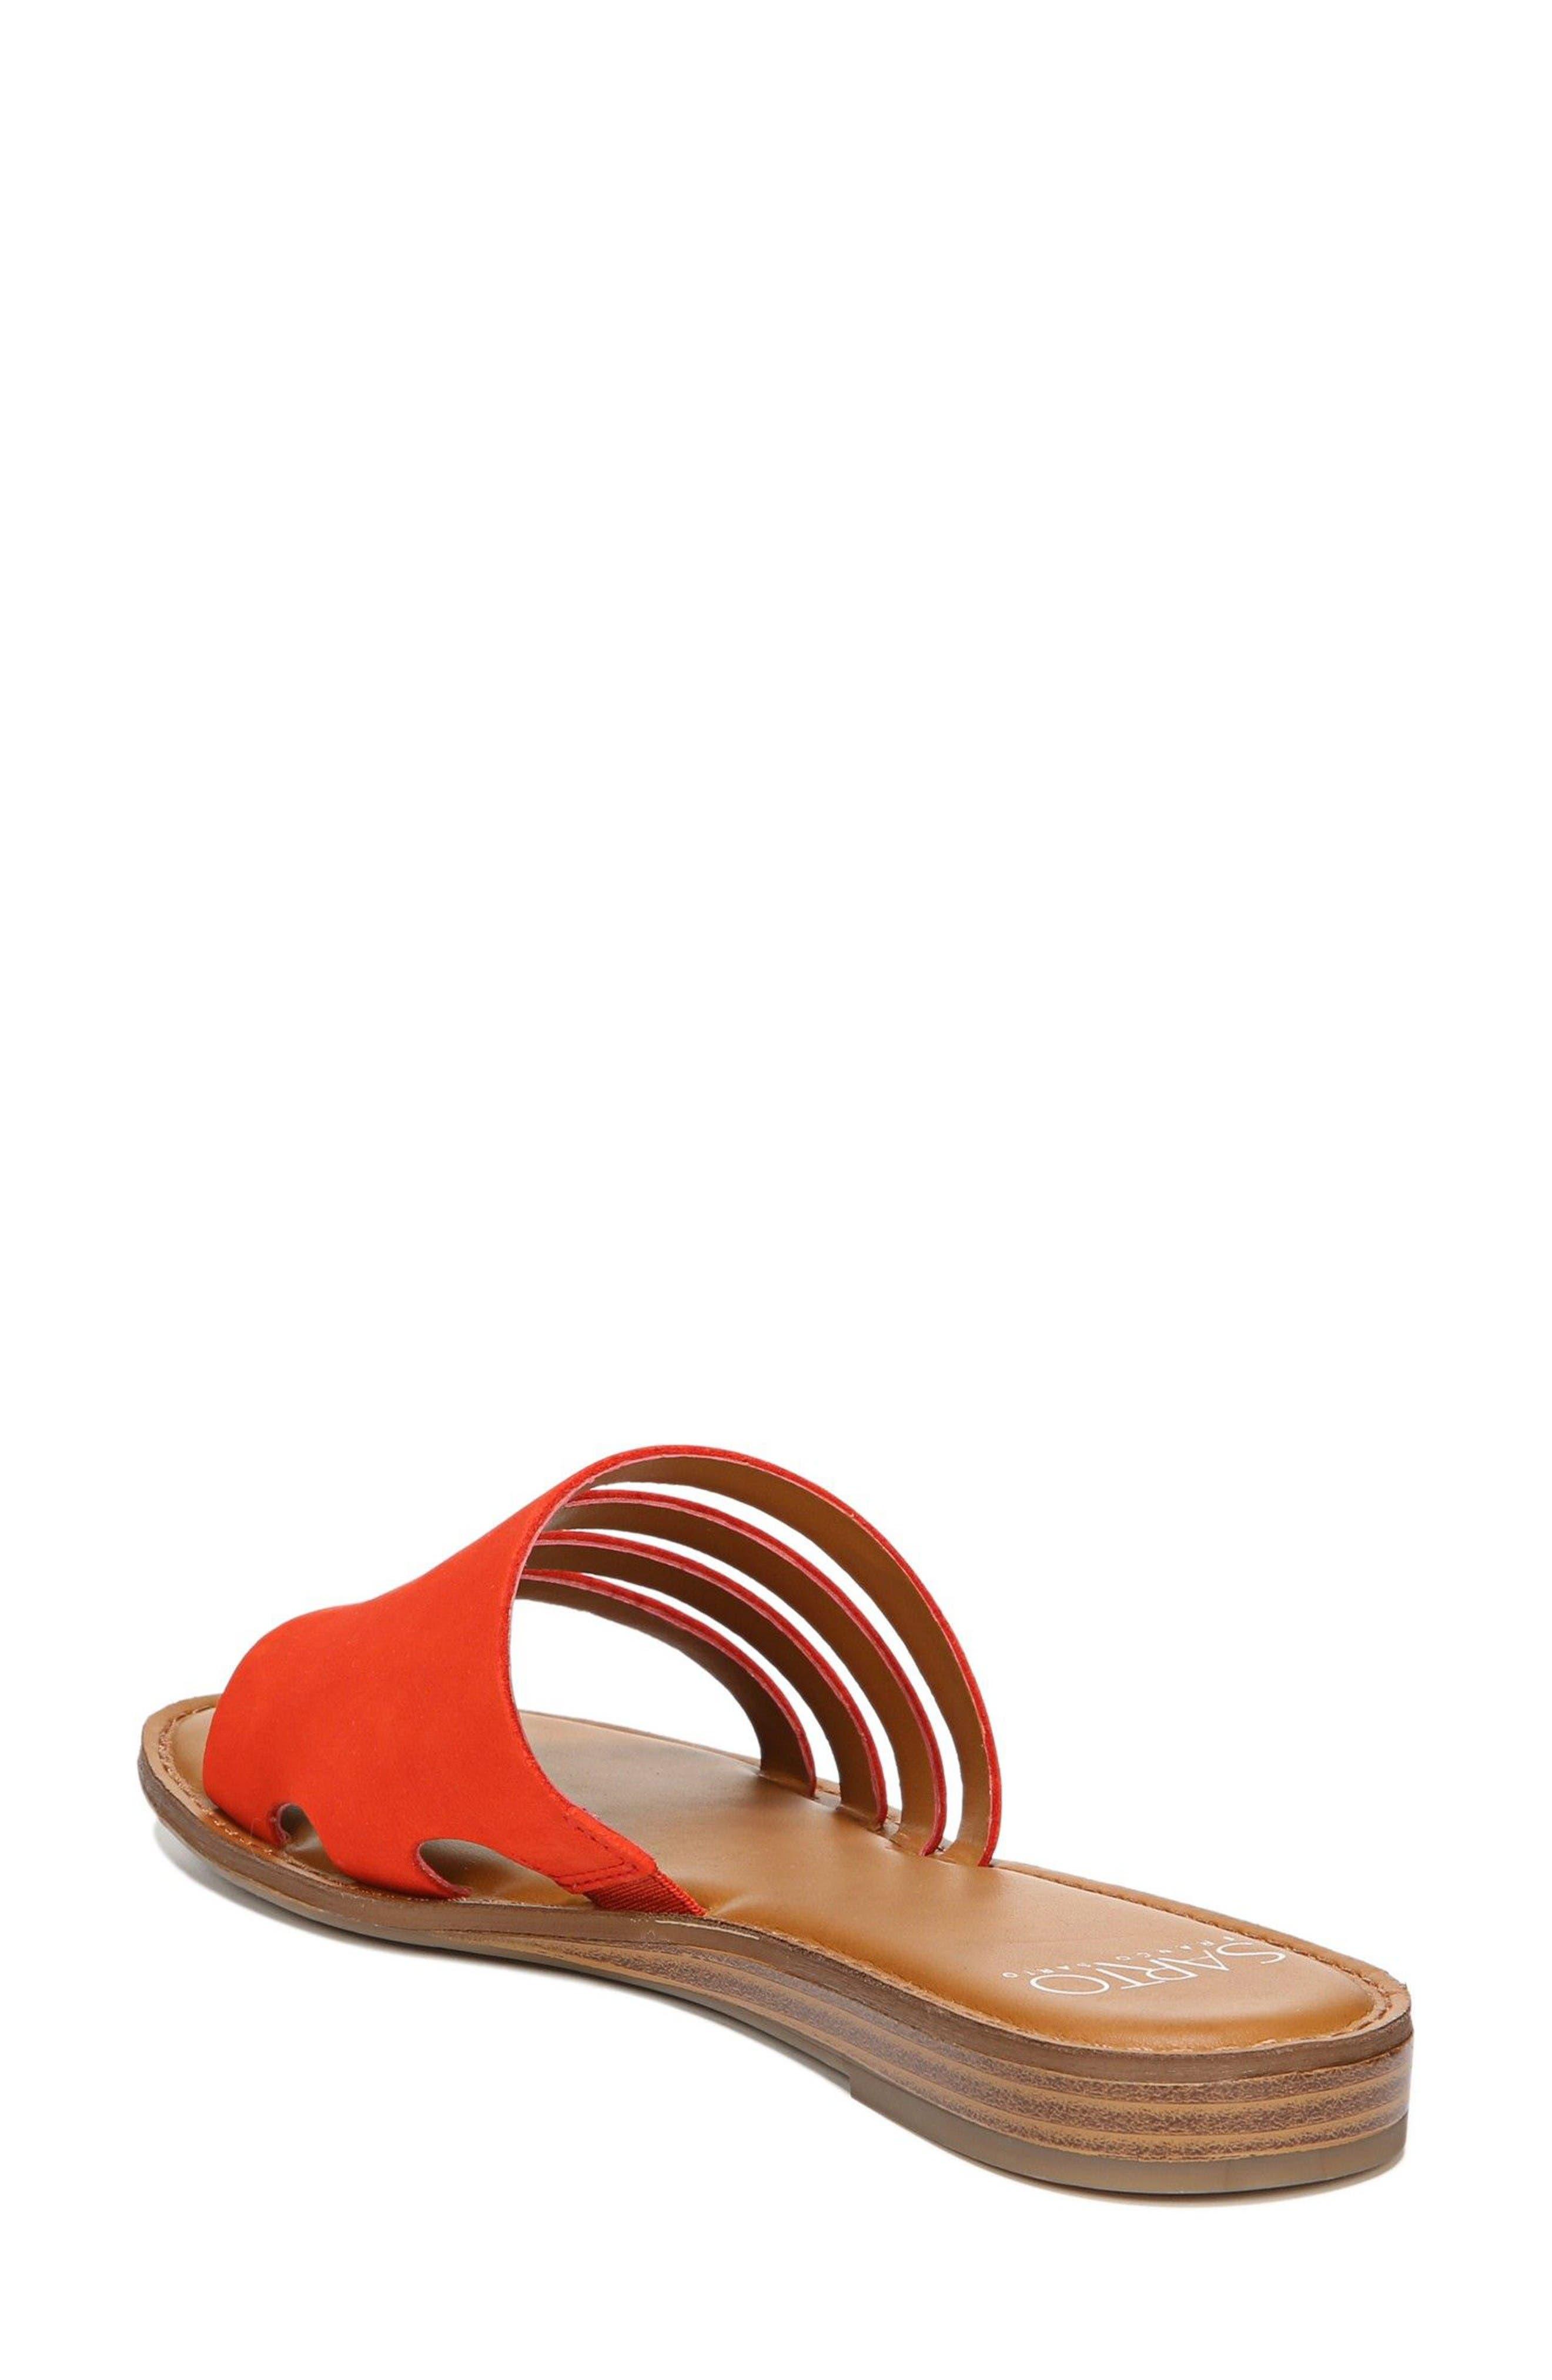 Alternate Image 2  - SARTO by Franco Sarto Gala Slide Sandal (Women)